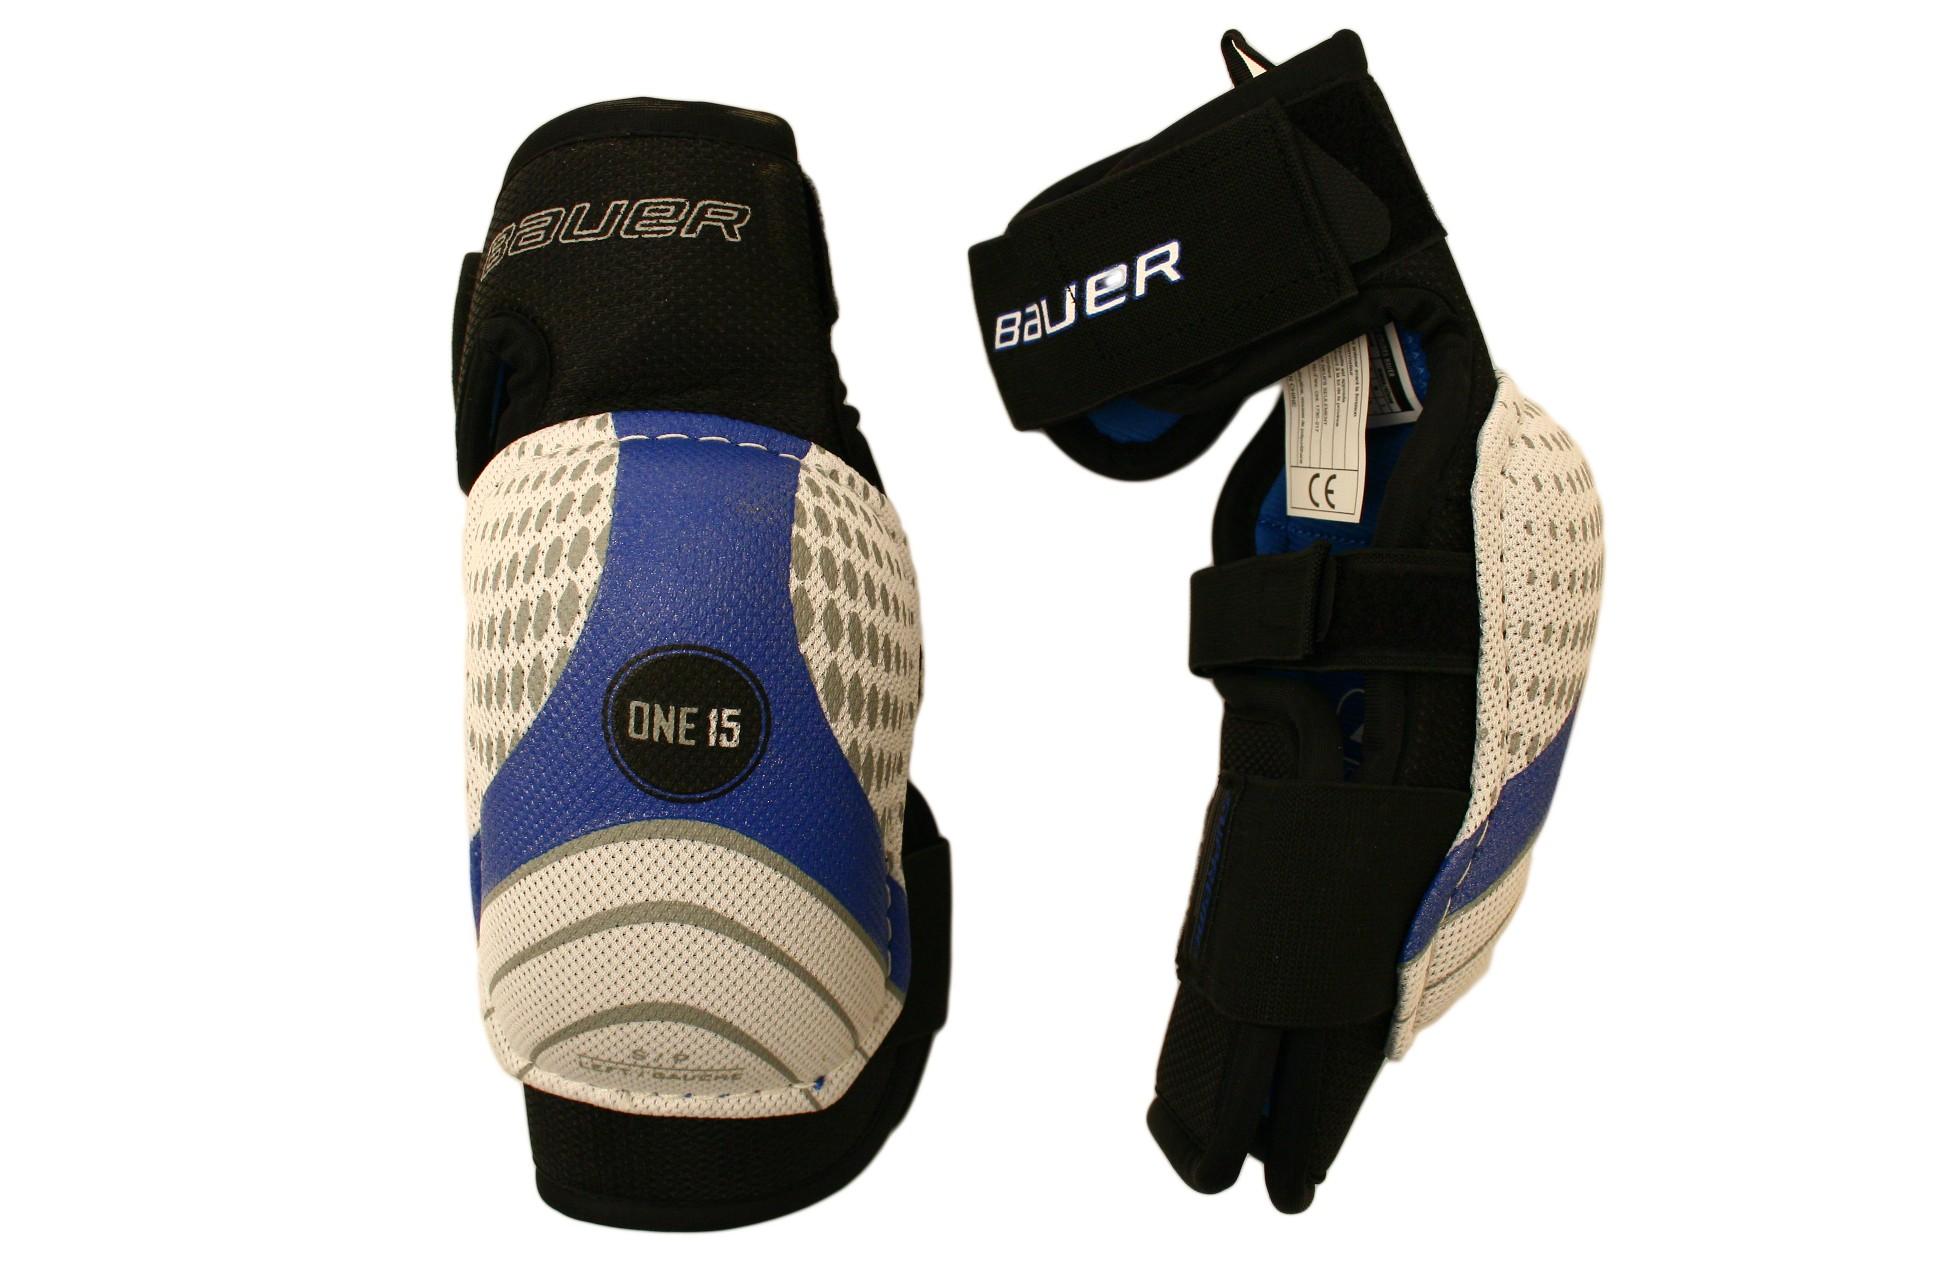 BAUER Supreme One 15 Soft Senior Elbow Pads